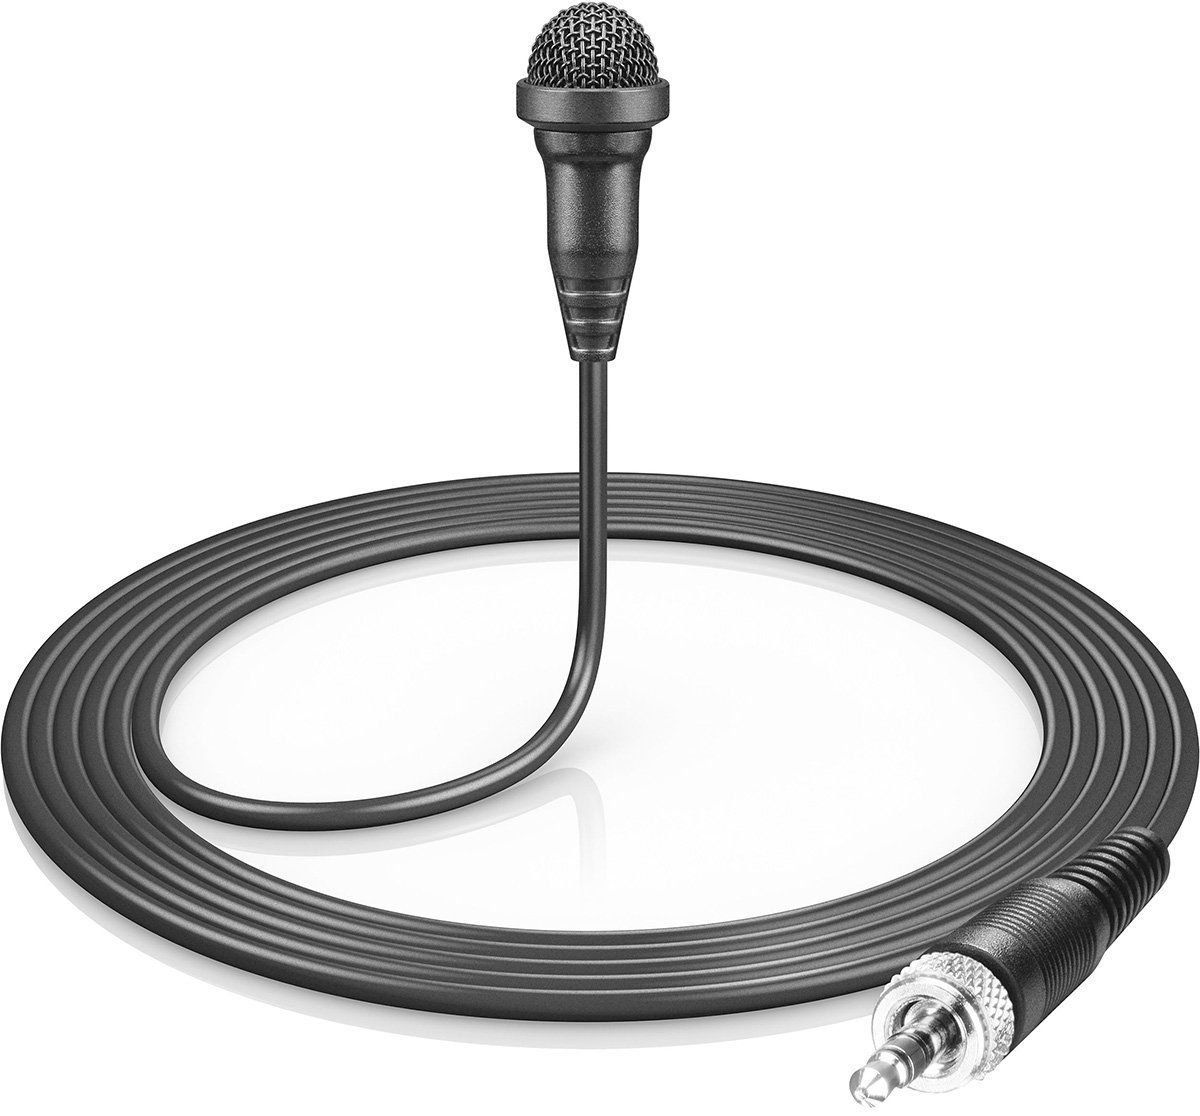 Sennheiser ME2 Microfone omnidirecional Sennheiser ME II de Lapela para Entrevistas